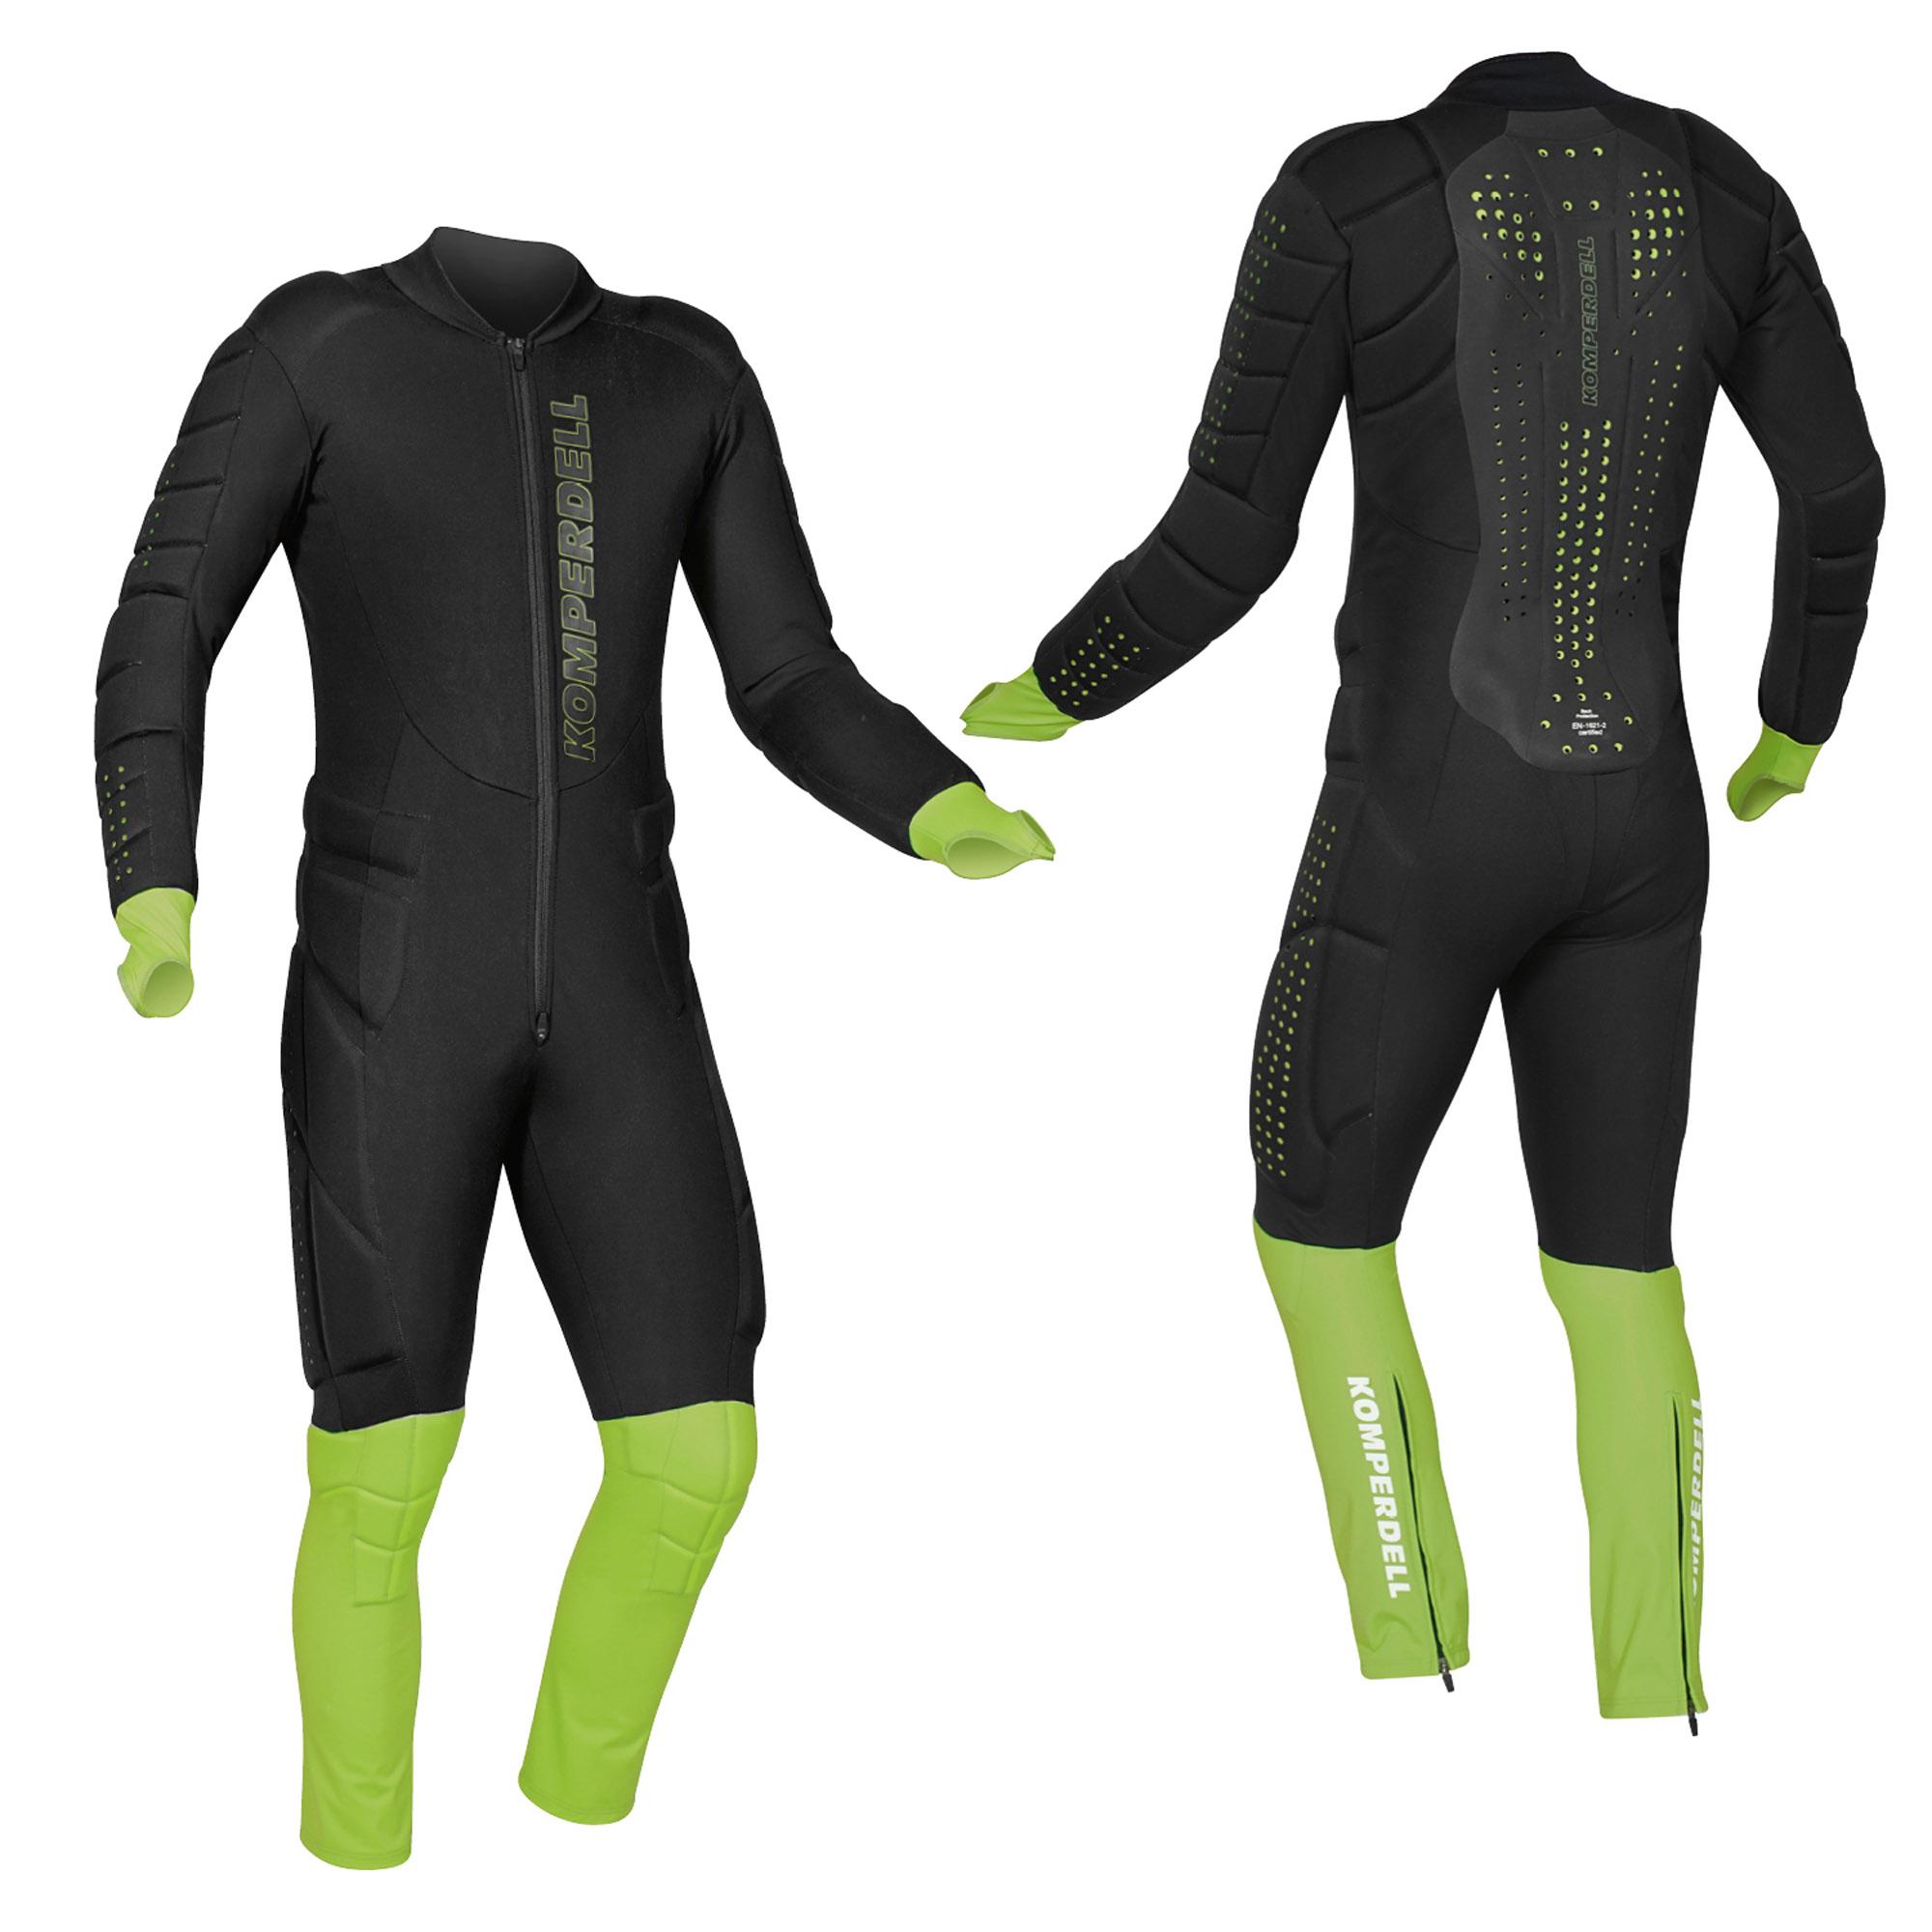 Full Protector Race Suit Junior